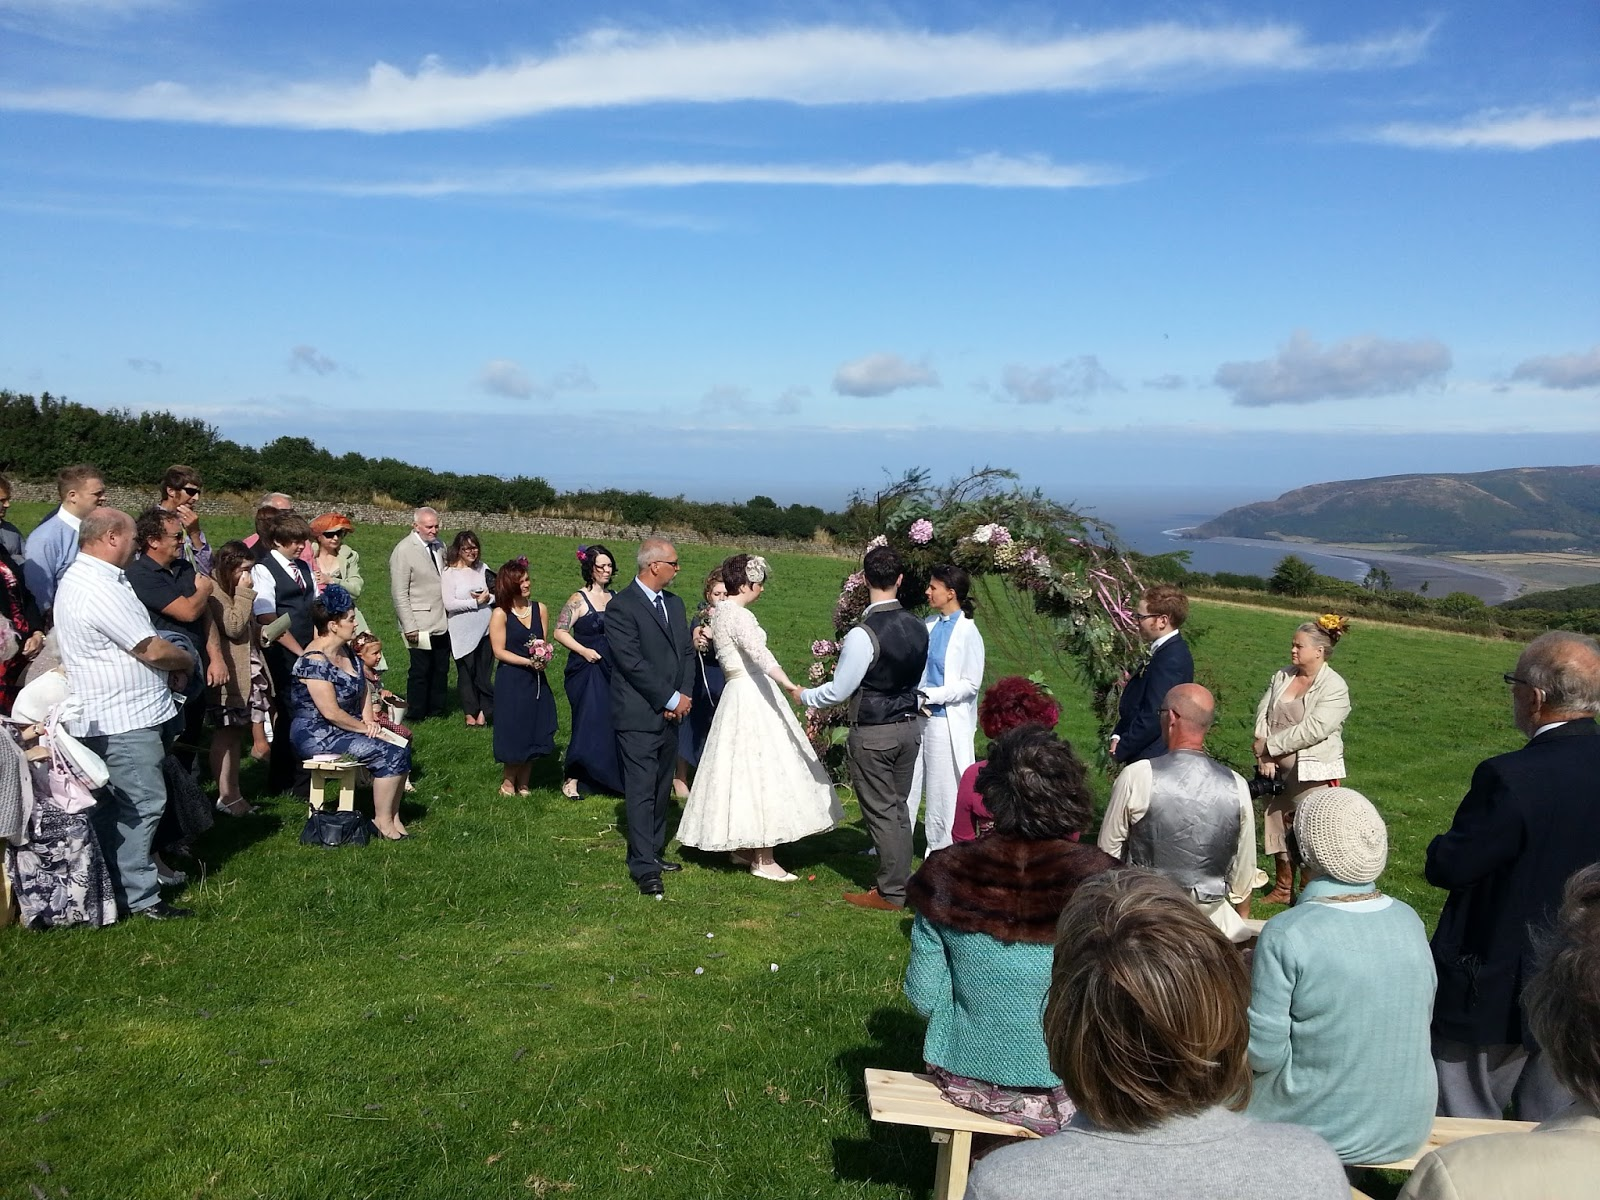 Theatre of Dreams: A Country Wedding, very romantic ...